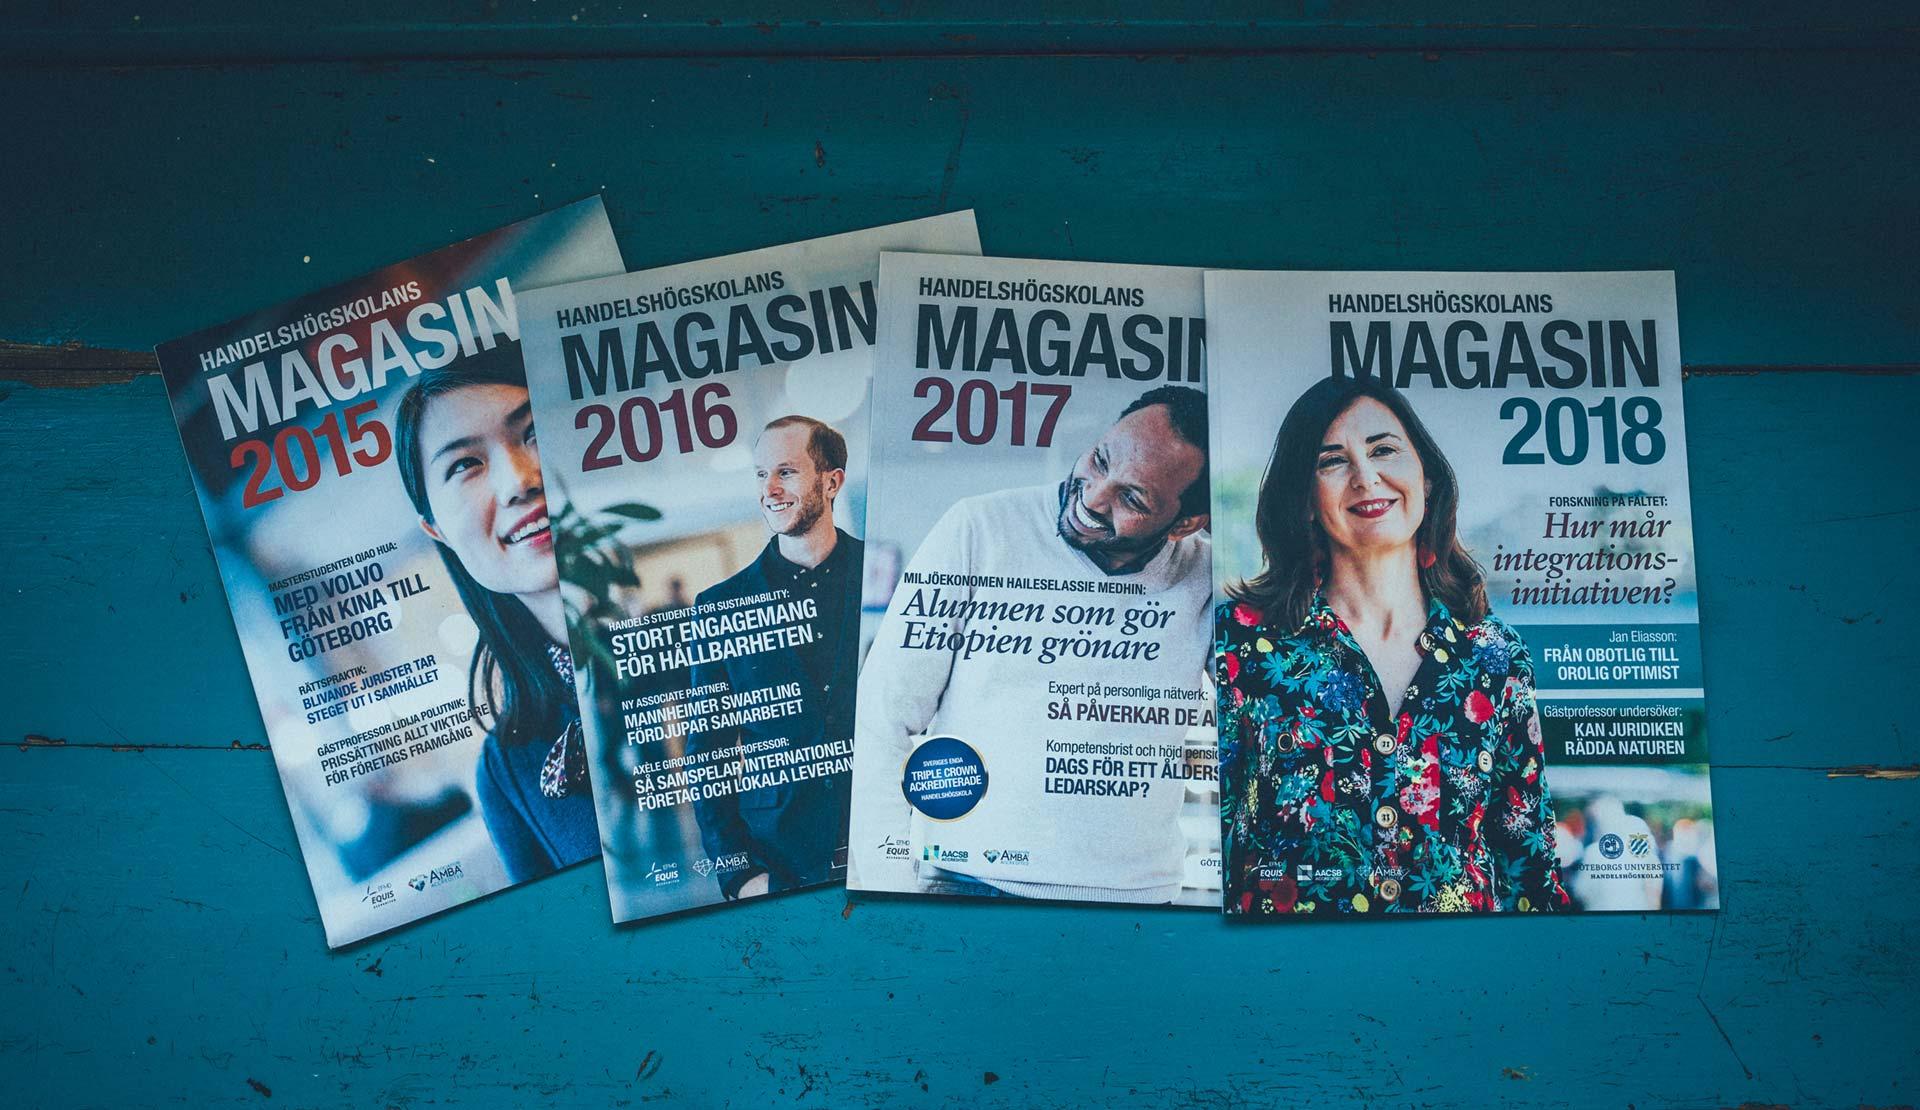 Handelshögskolans årsmagasin 2015-2018